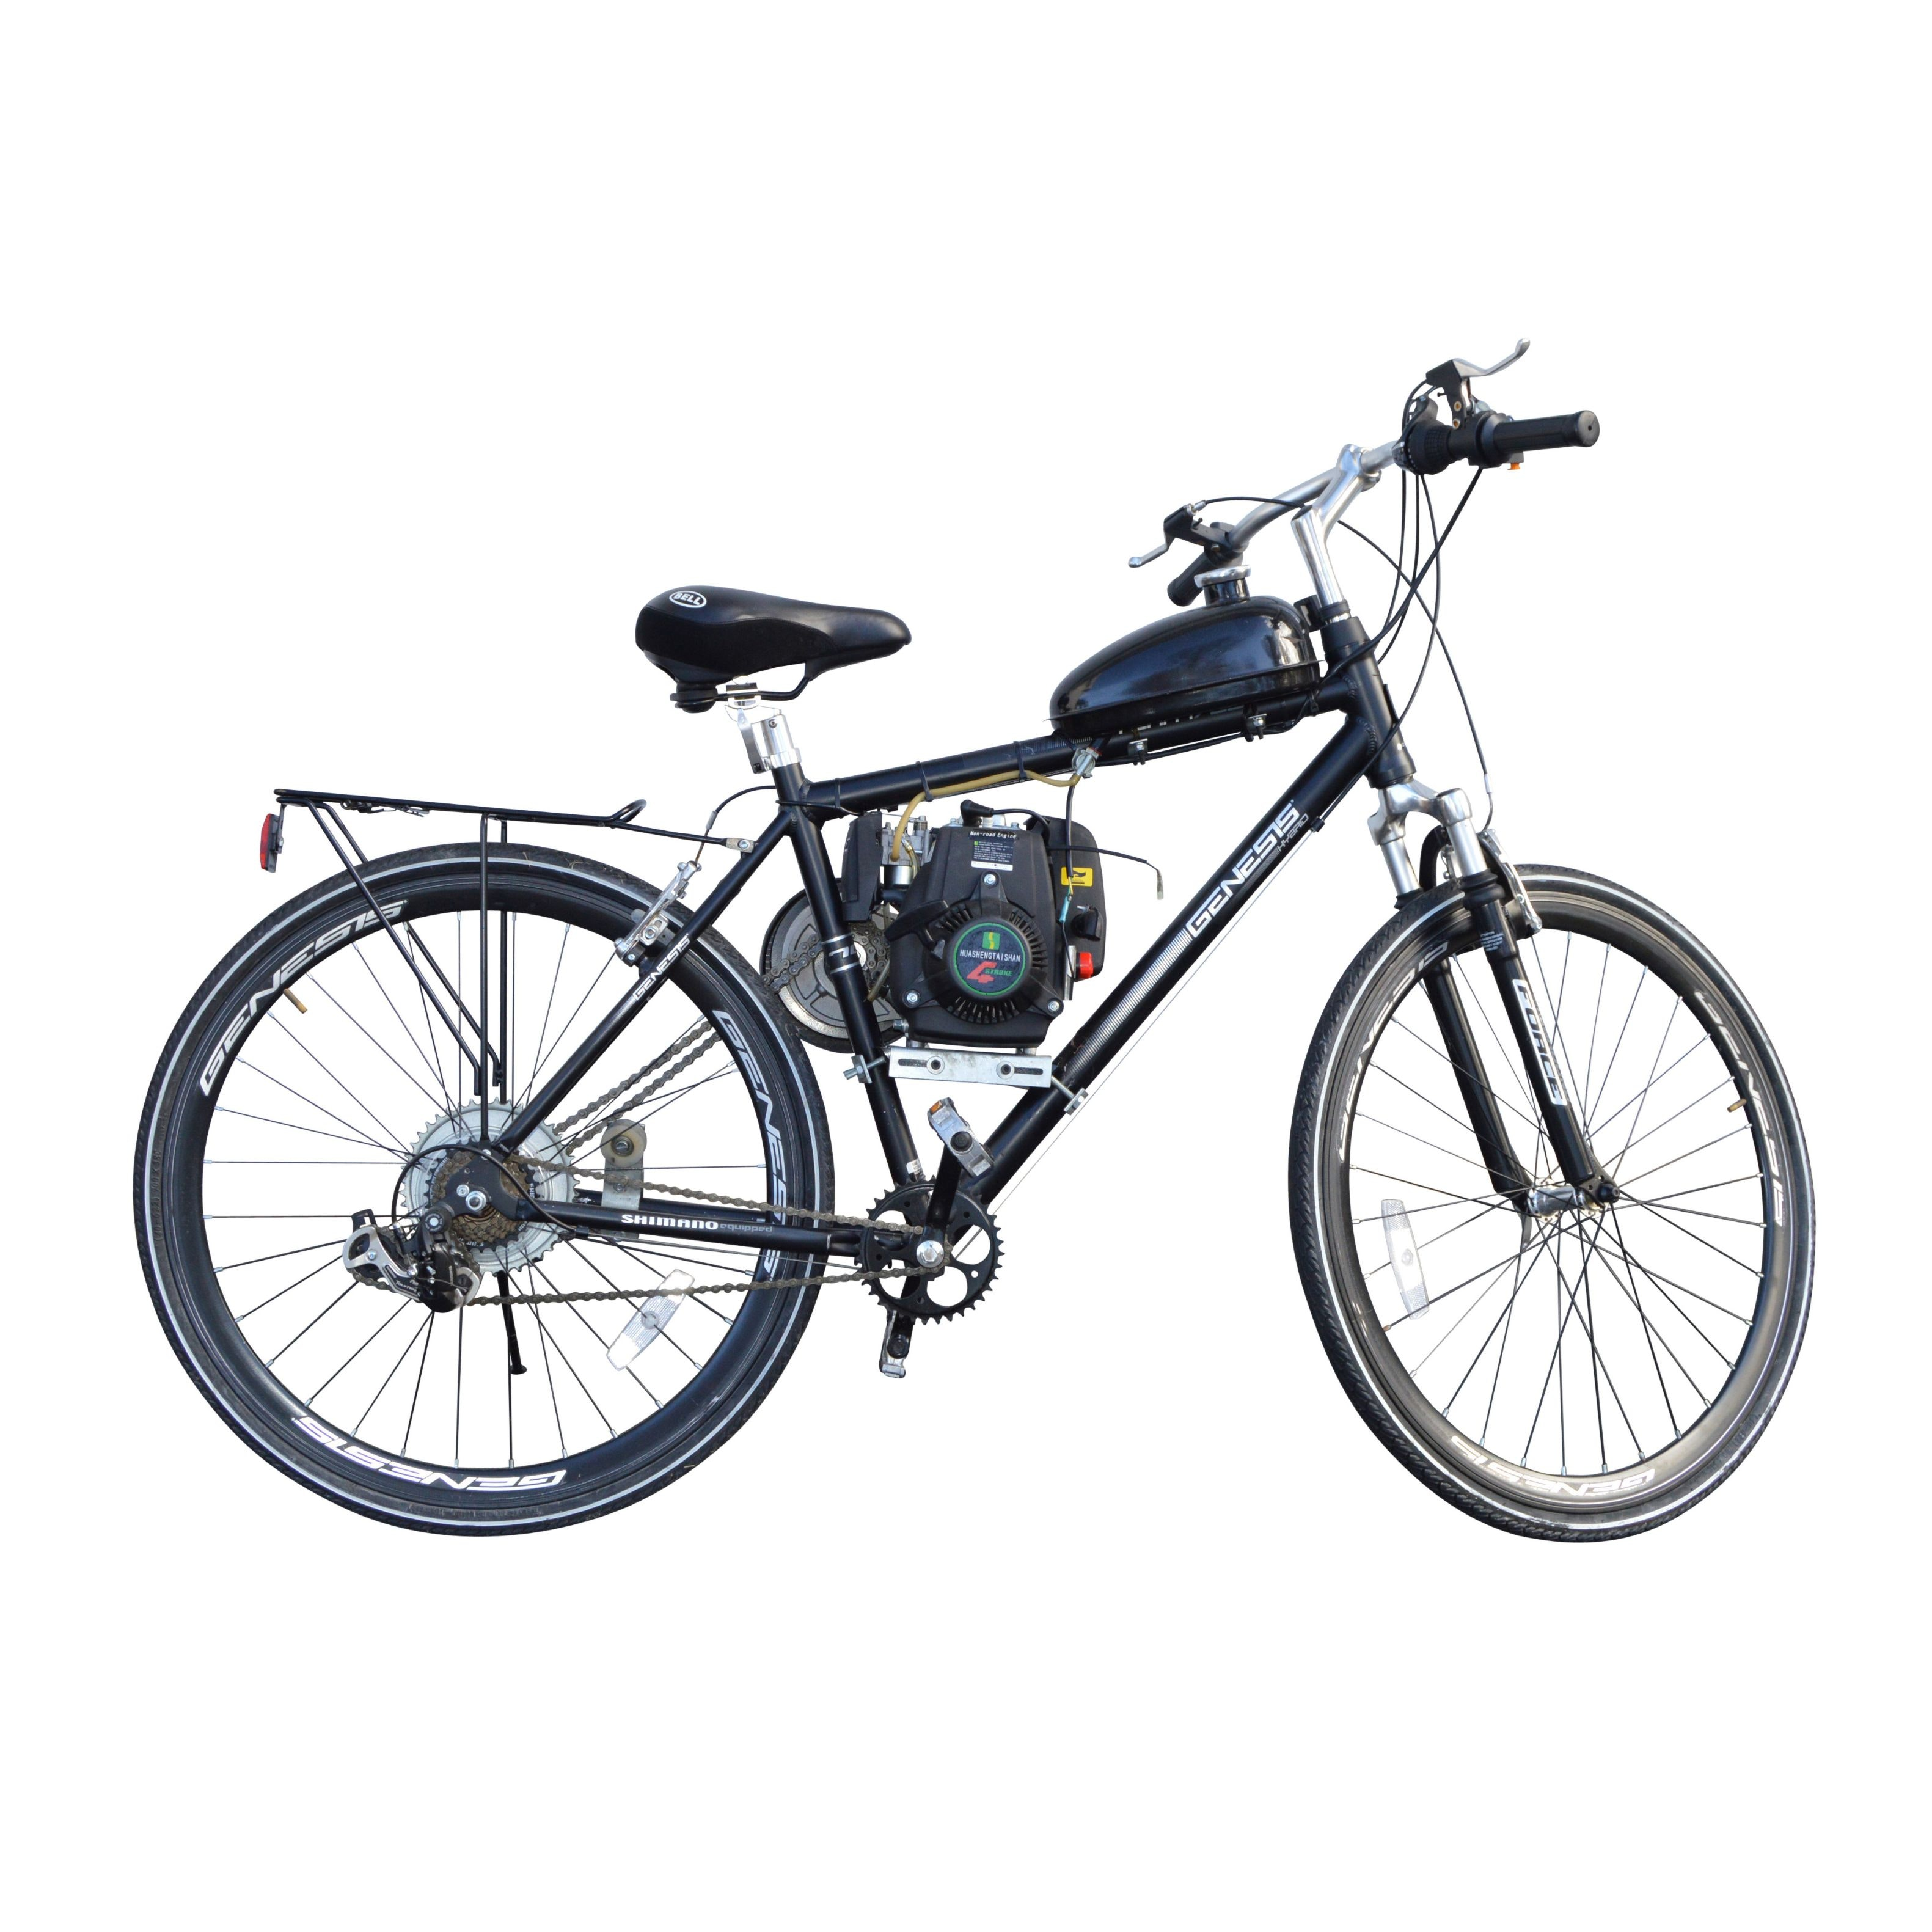 Genesis Hybrid Motorized Bicycle